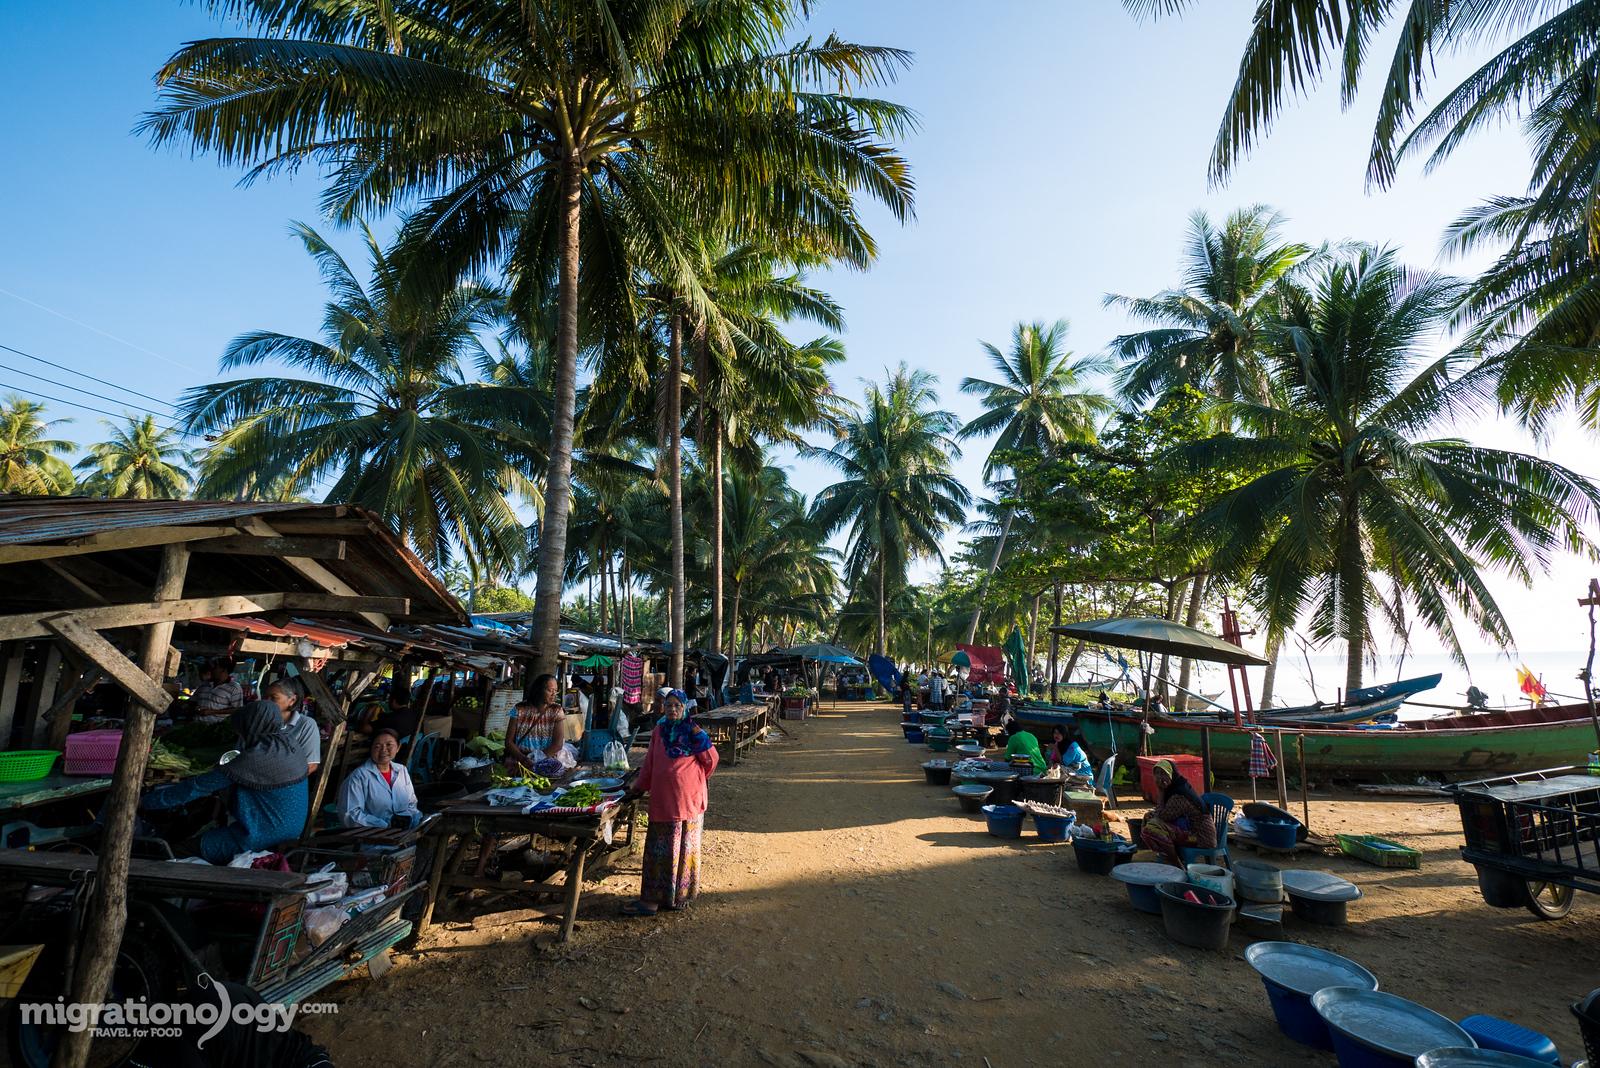 Talad Baan Plai Thon (ตลาดบ้านปลายทอน)